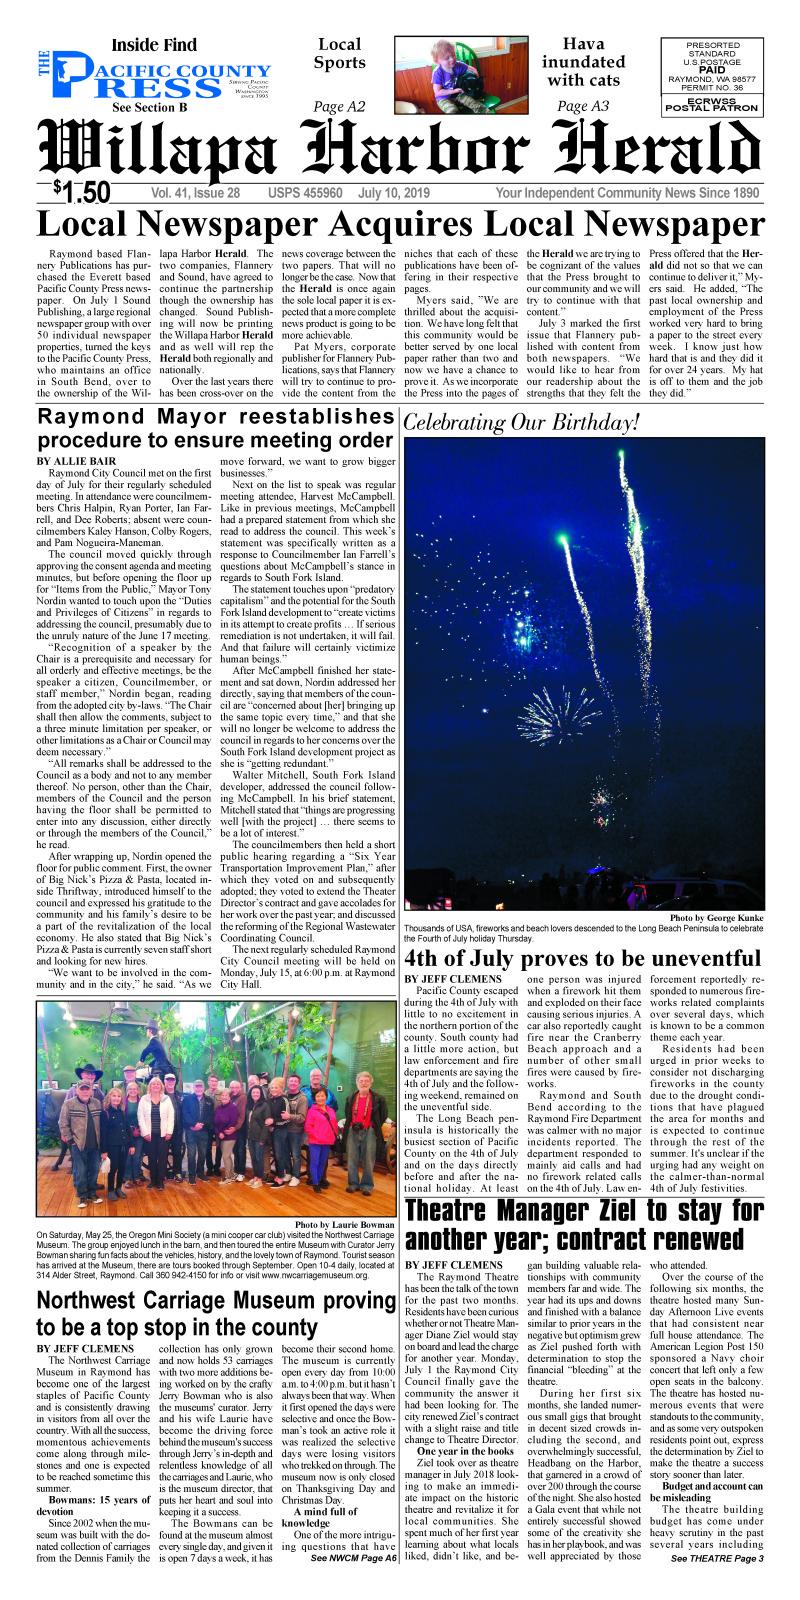 July 10, 2019 Willapa Harbor Herald